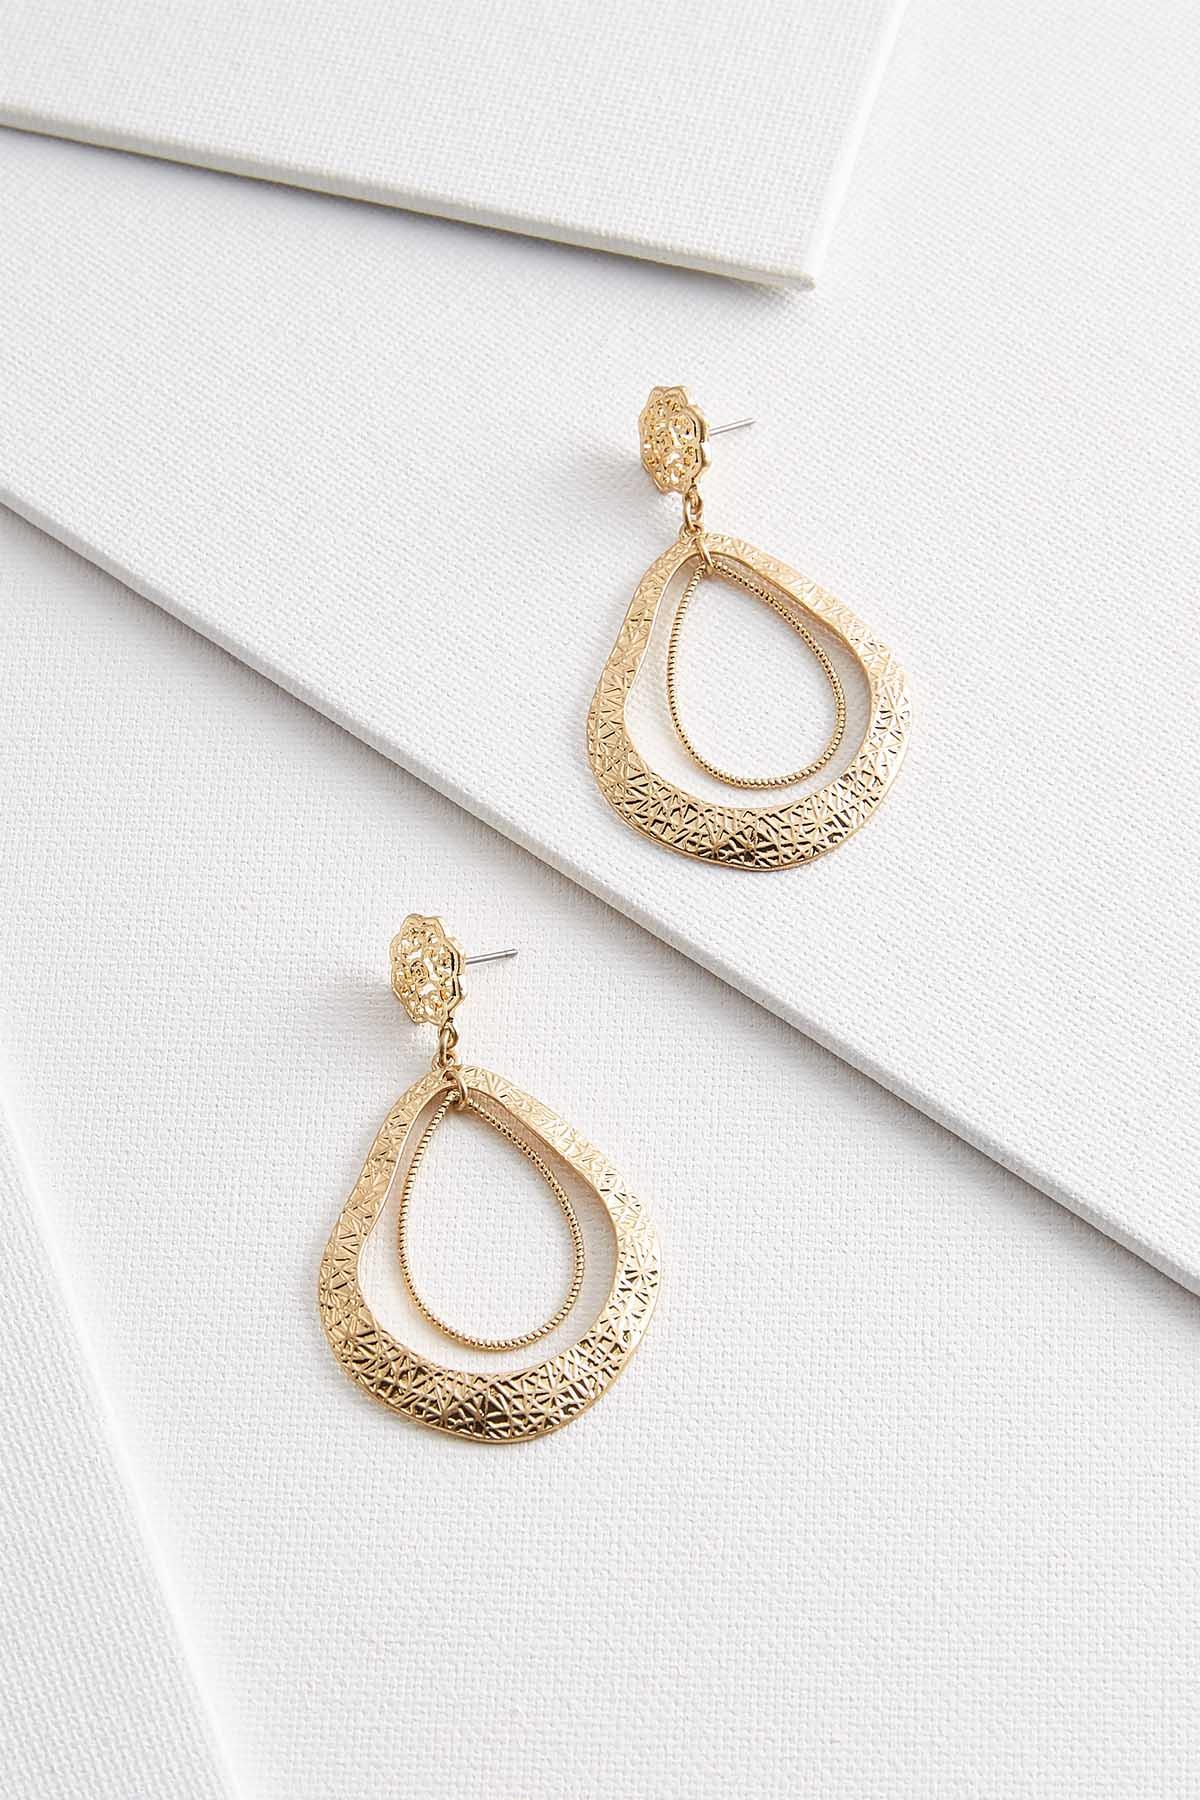 Vintage Textured Gold Earrings